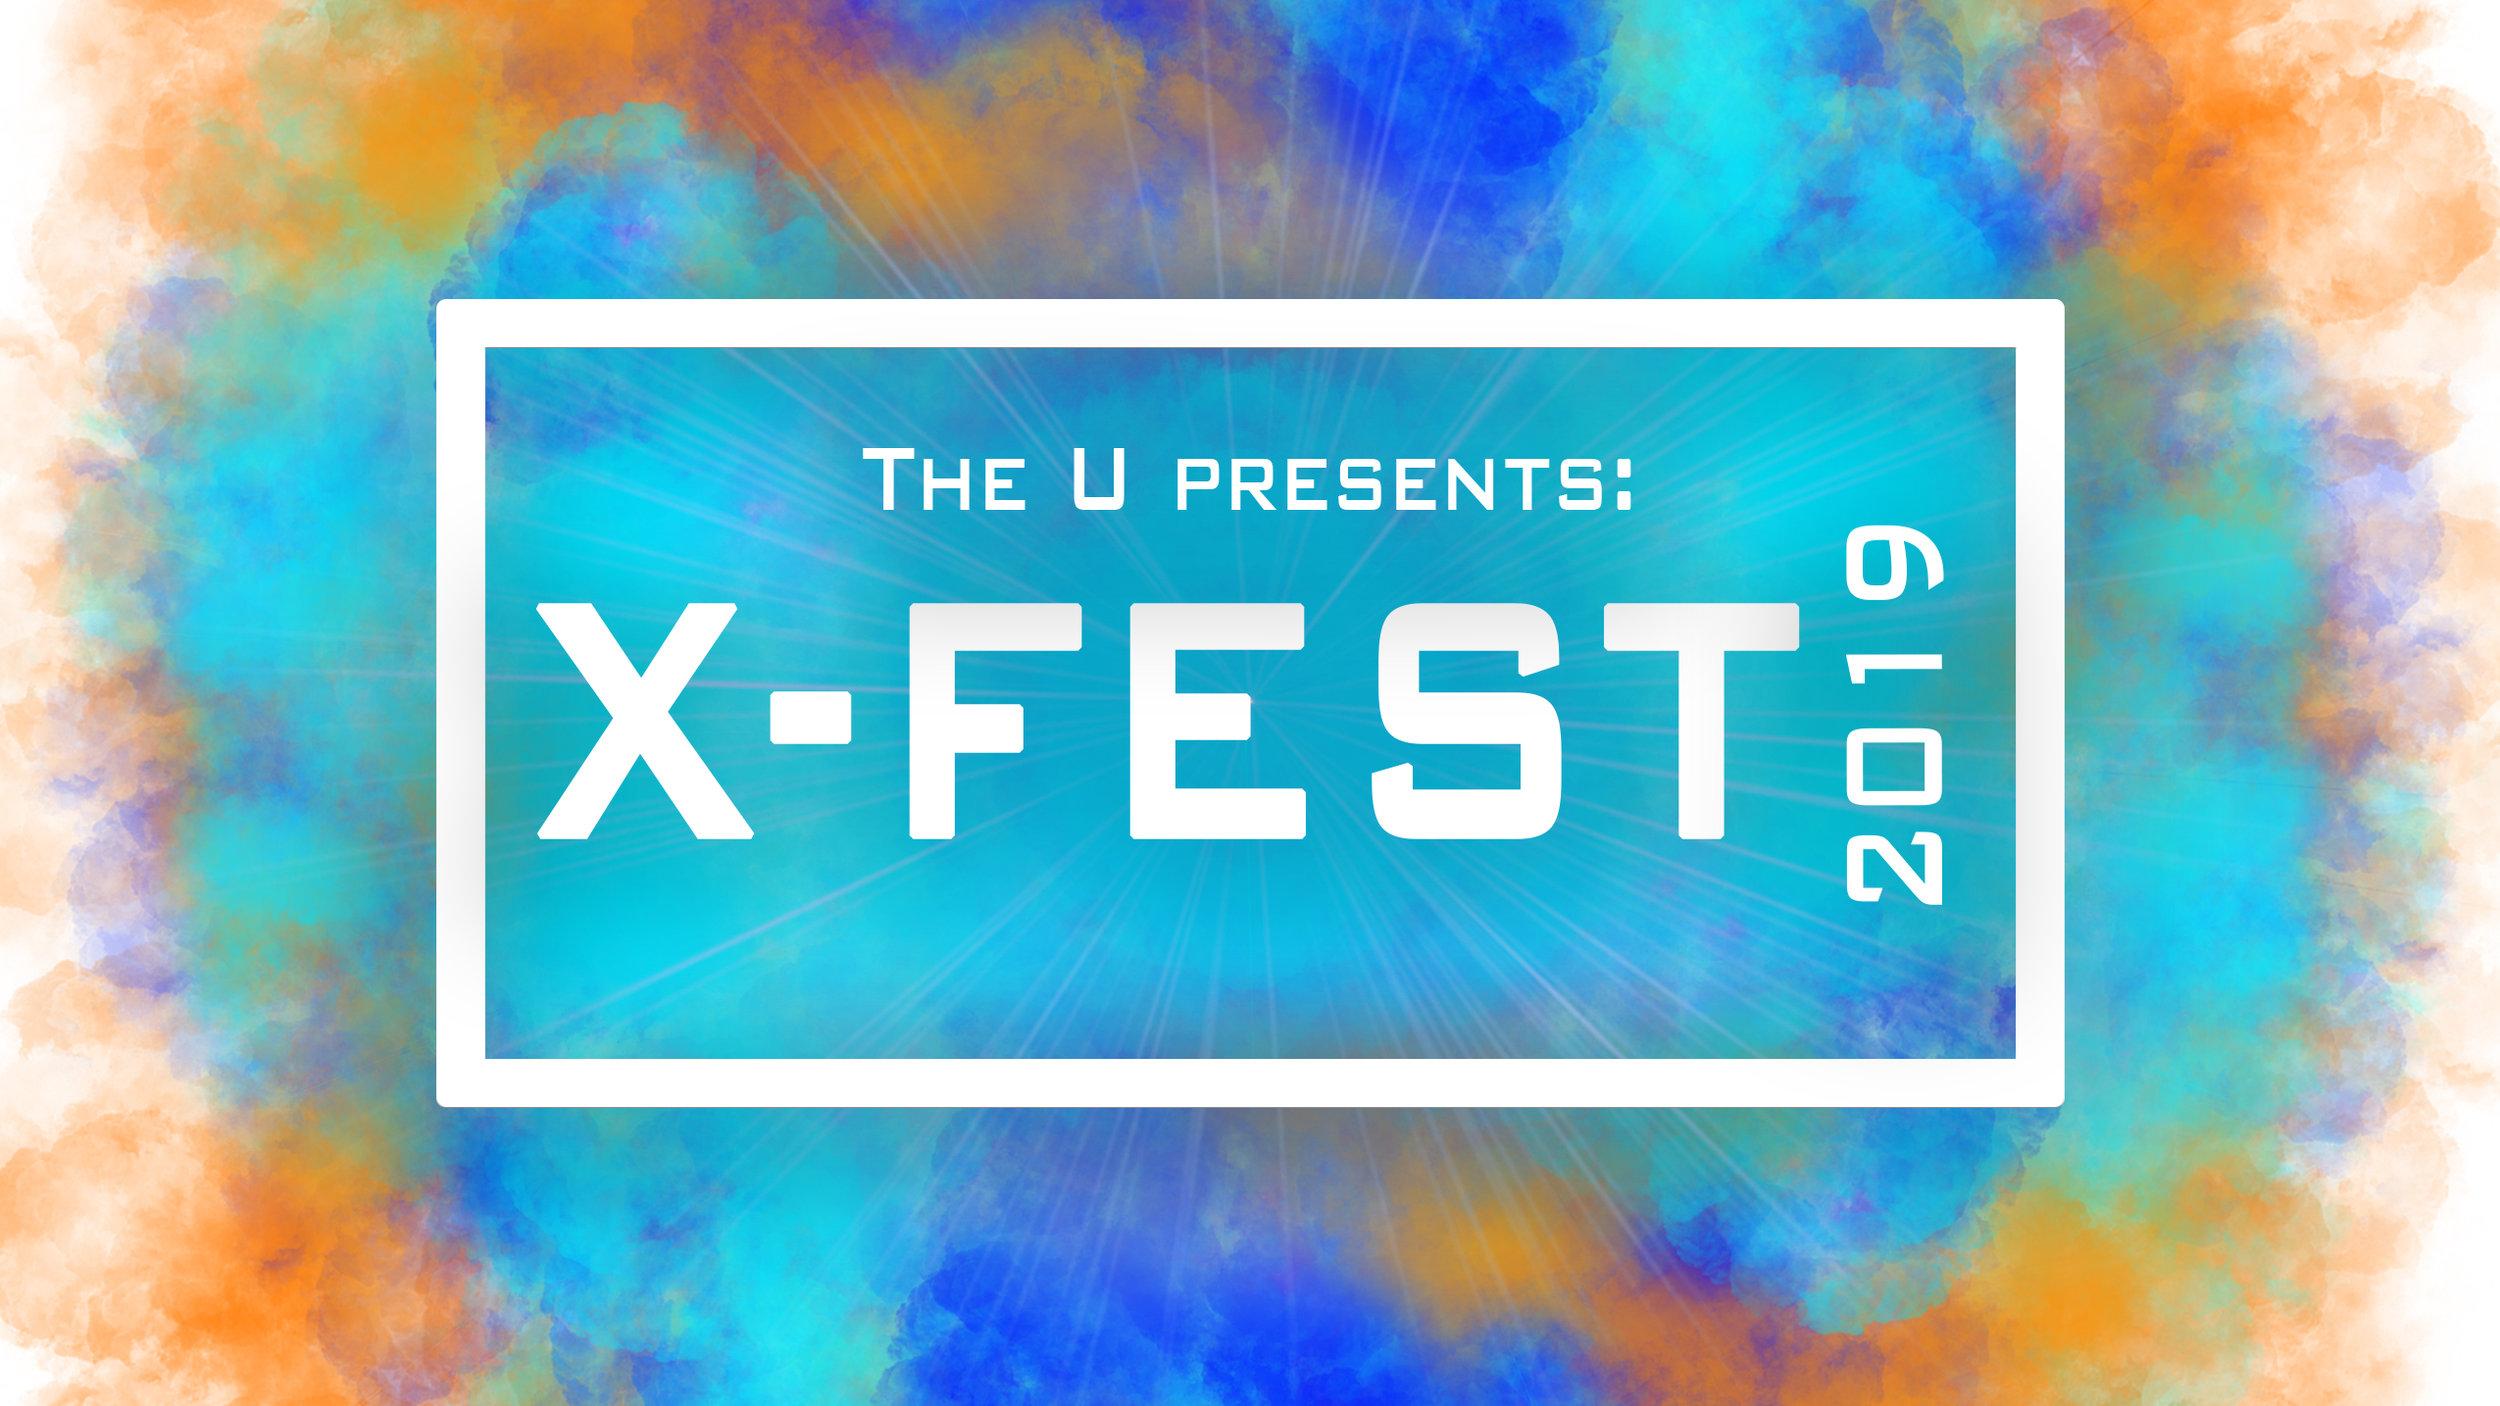 XFEST2019 logo 9x16.jpg